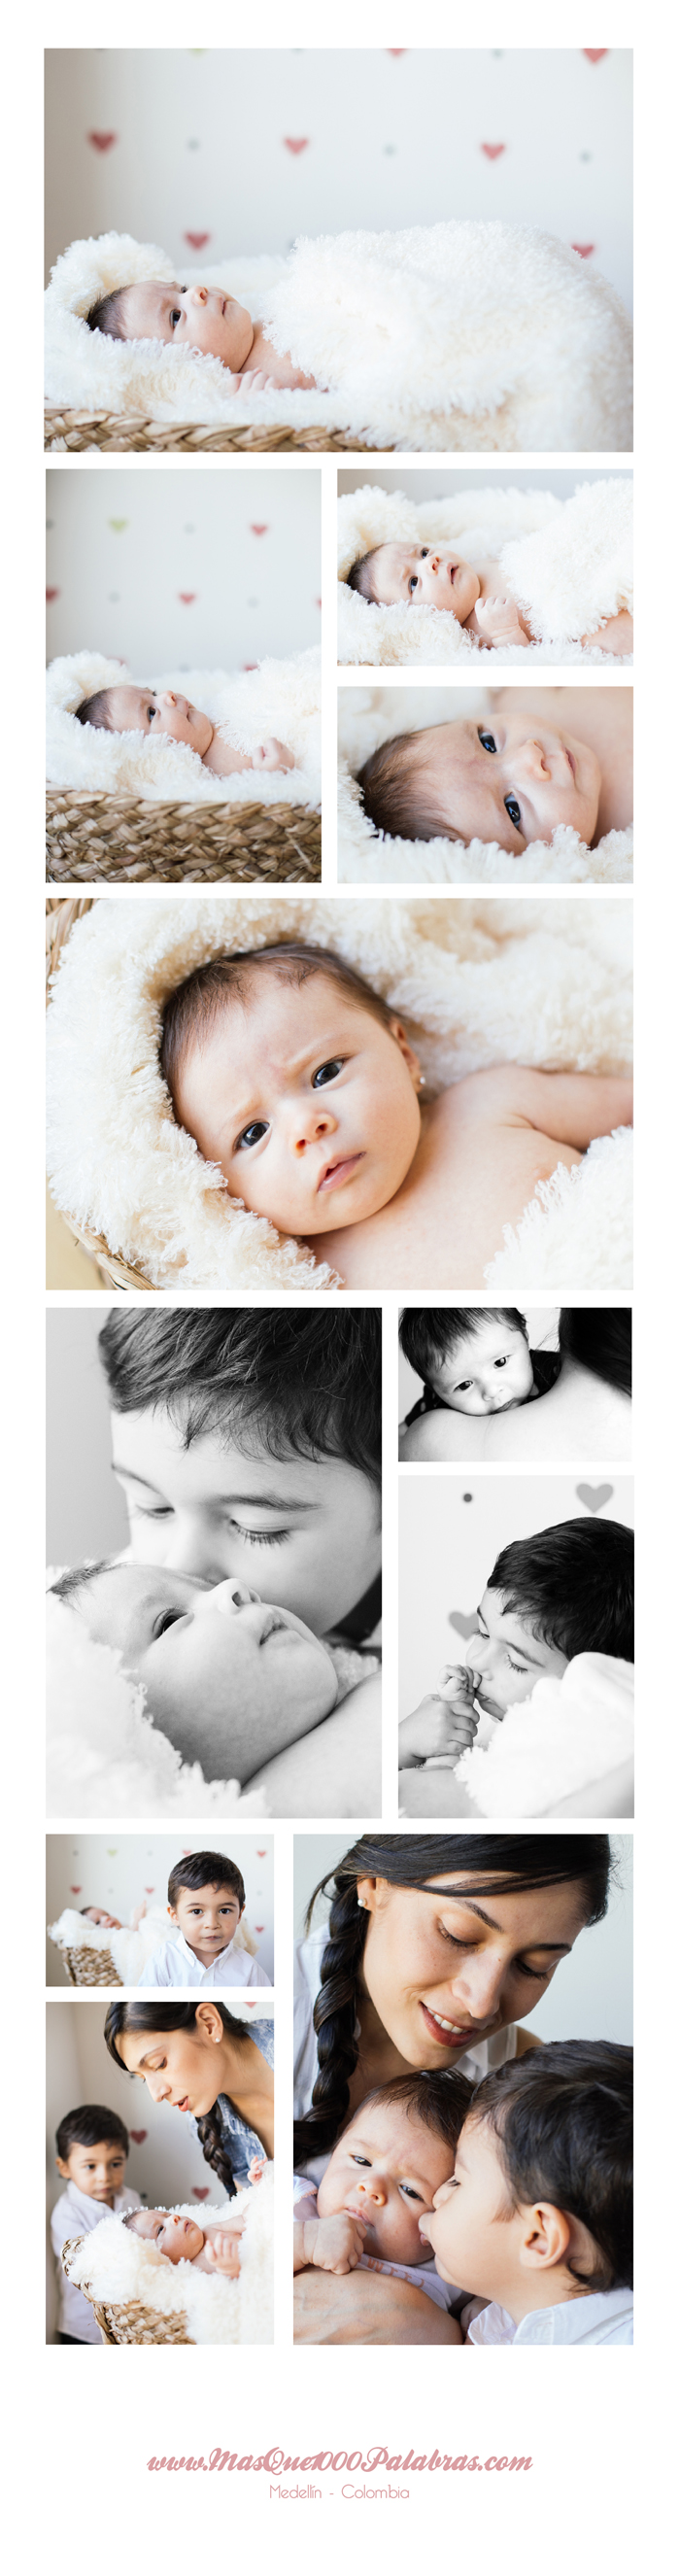 sofia, bebe, newborn, recien nacida, fotografia, hogar, familia, hermanitos